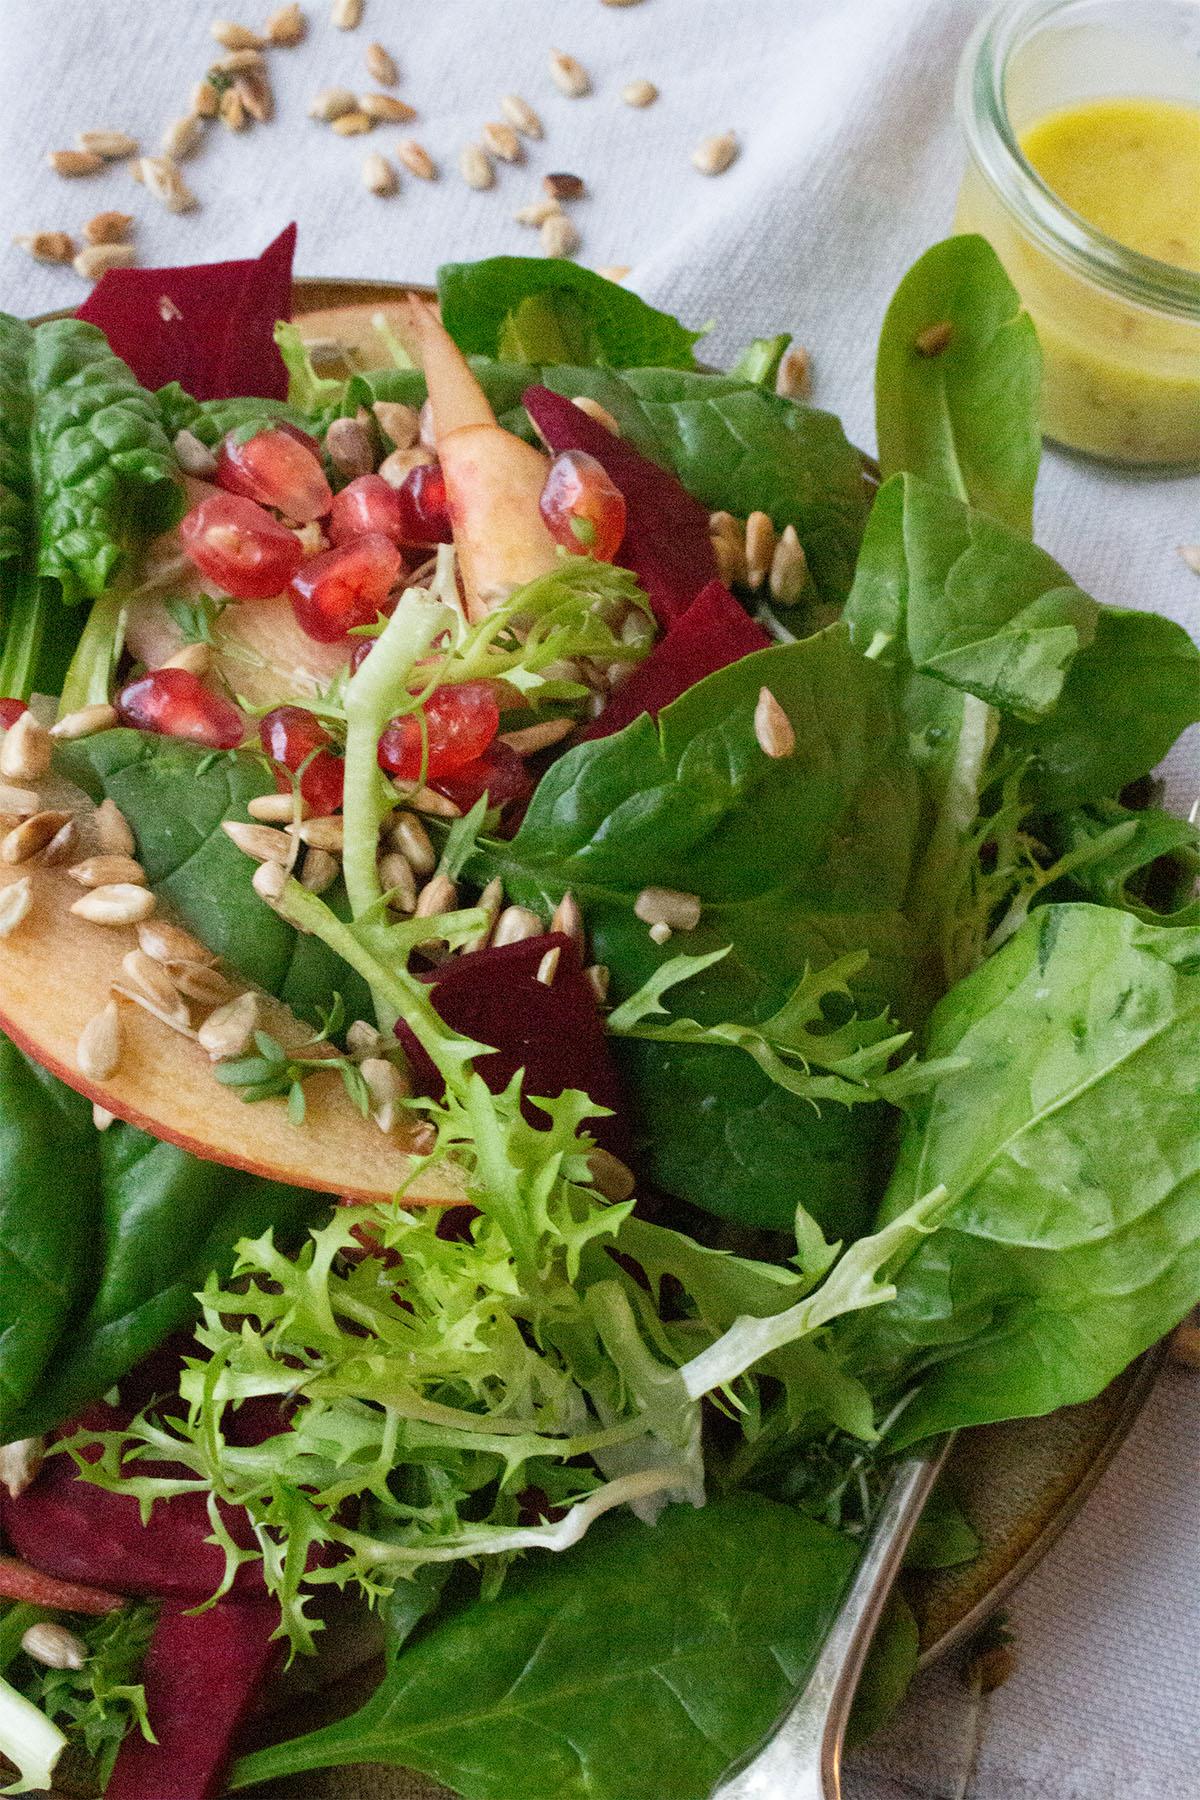 Friseesalat mit Babyspinat, Granatapfel und Äpfeln